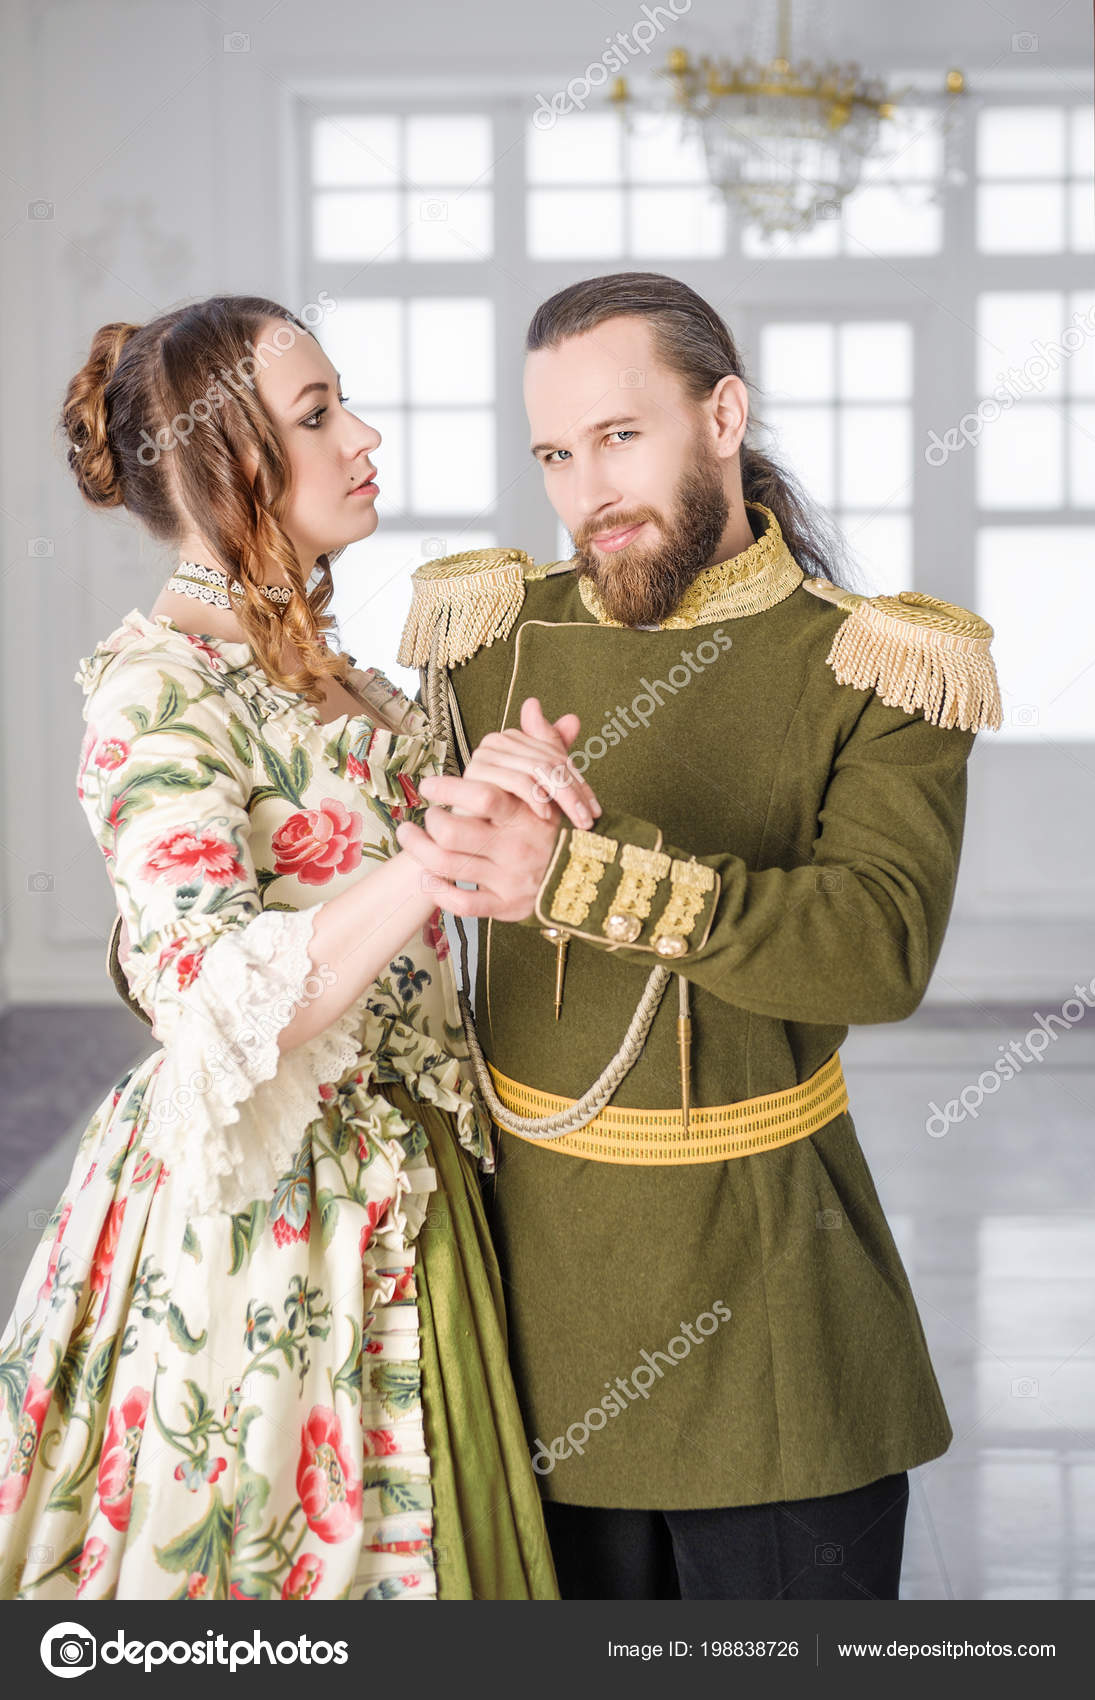 3709396c68d9 Όμορφο Ζευγάρι Άνδρα Και Γυναίκας Ιστορικά Μεσαιωνικά Κοστούμια — Φωτογραφία  Αρχείου